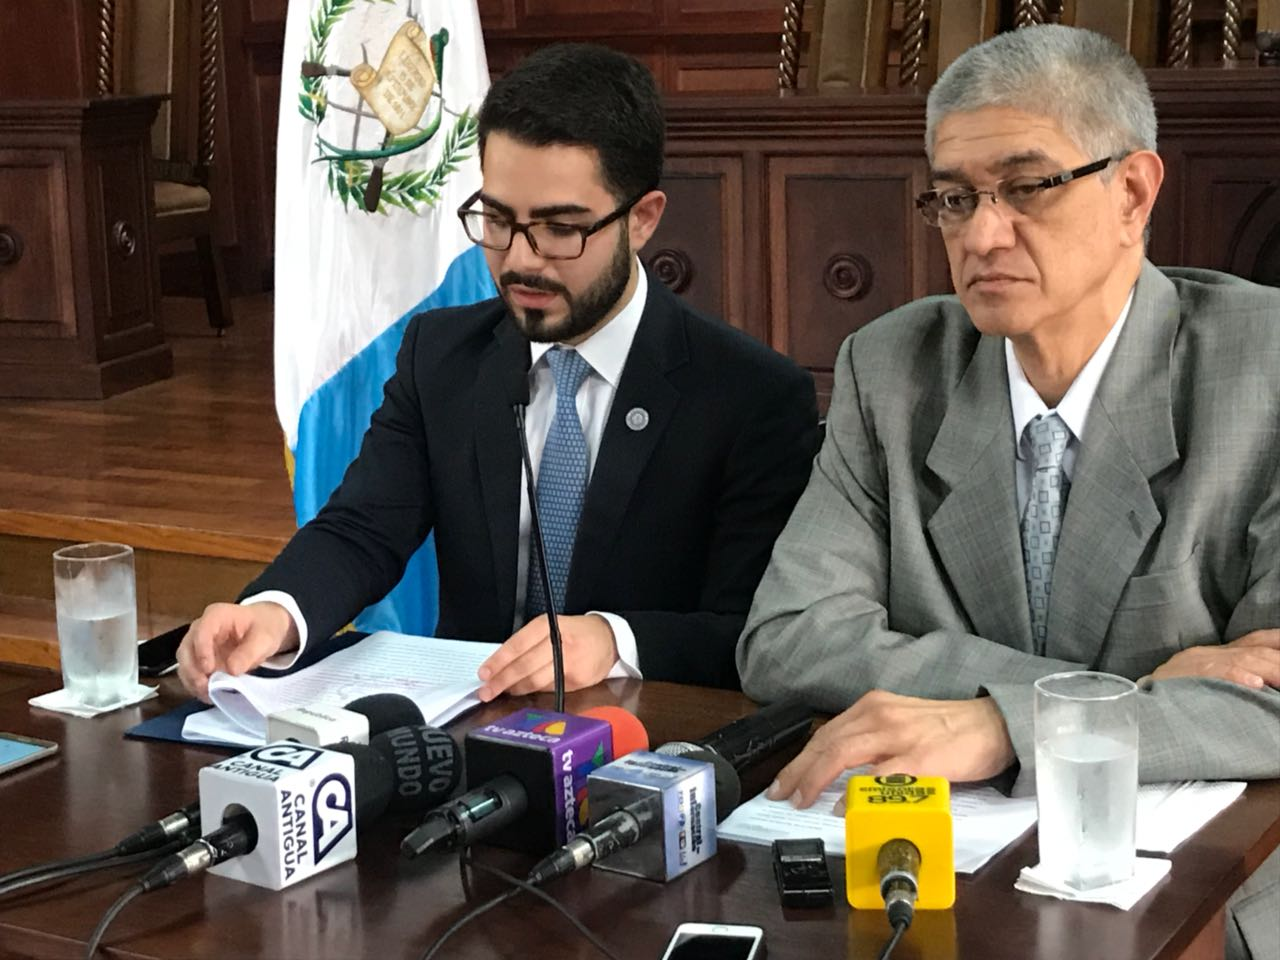 Conferencia de prensa de la CC EU Emisoras Unidas Guatemala